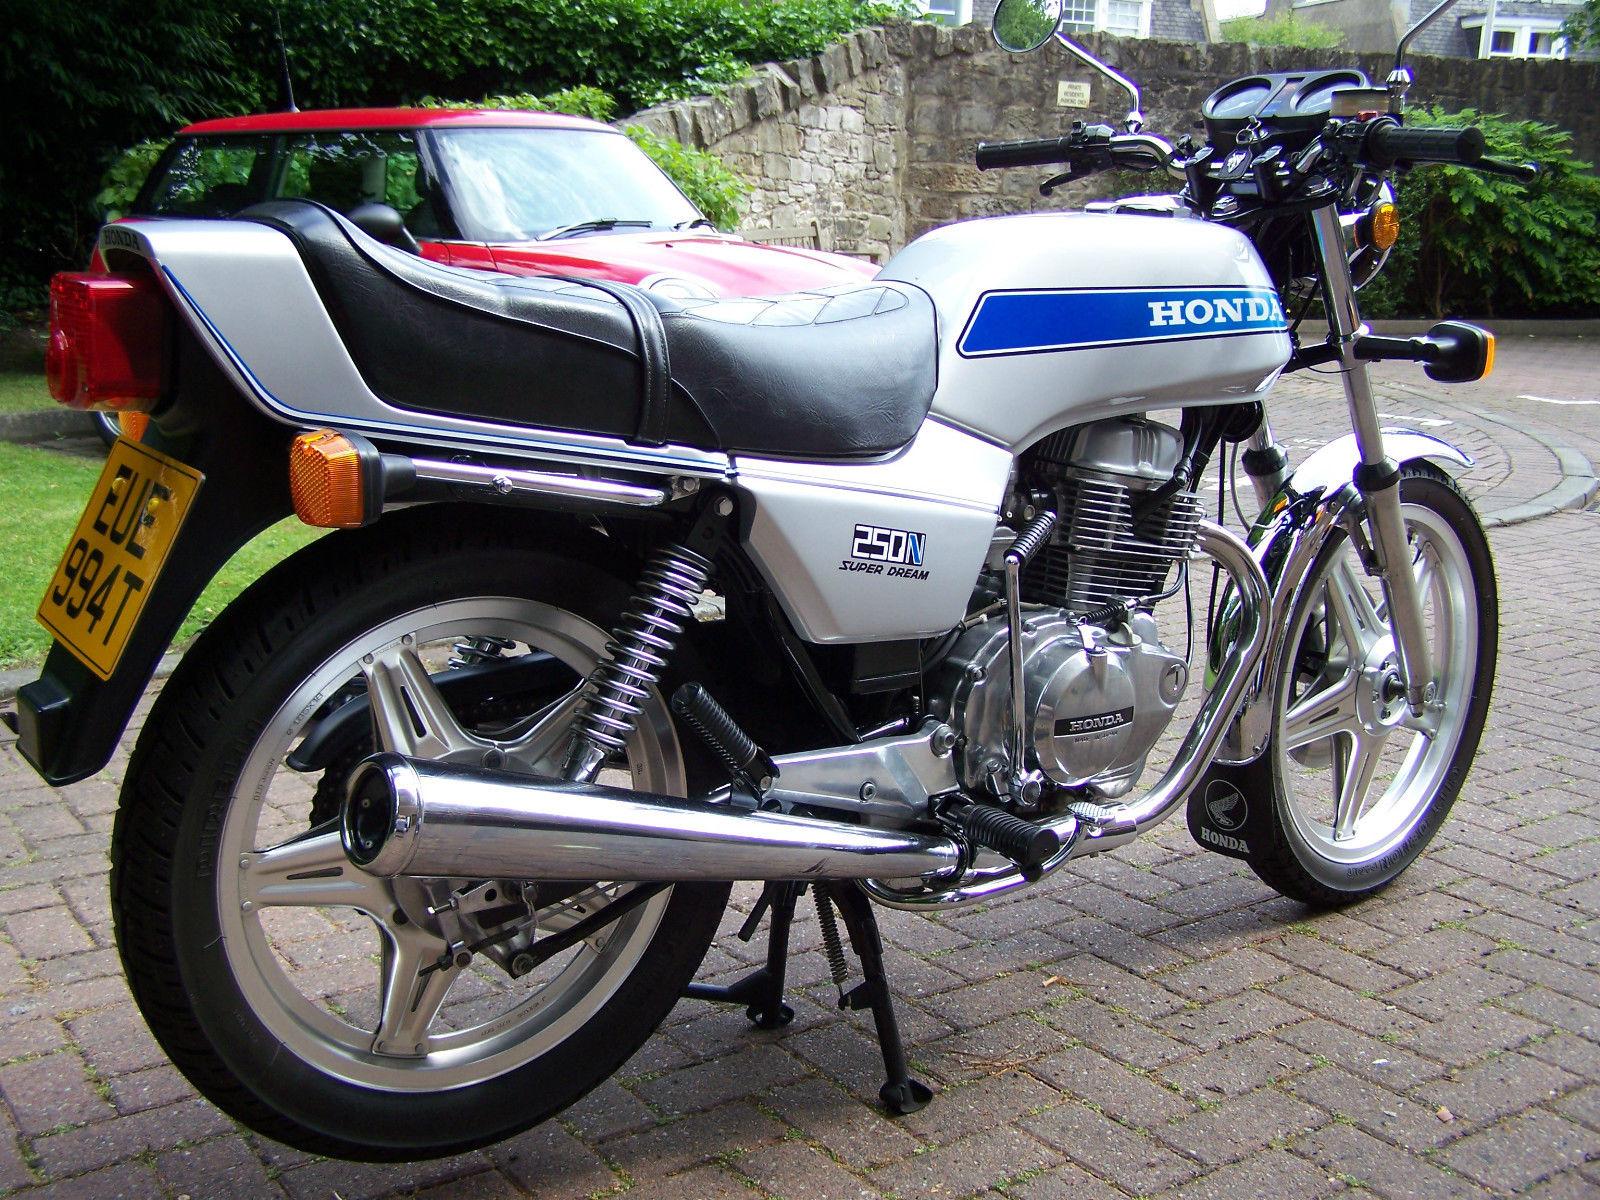 Restored Honda CB250N Superdream -1979 Photographs at ...